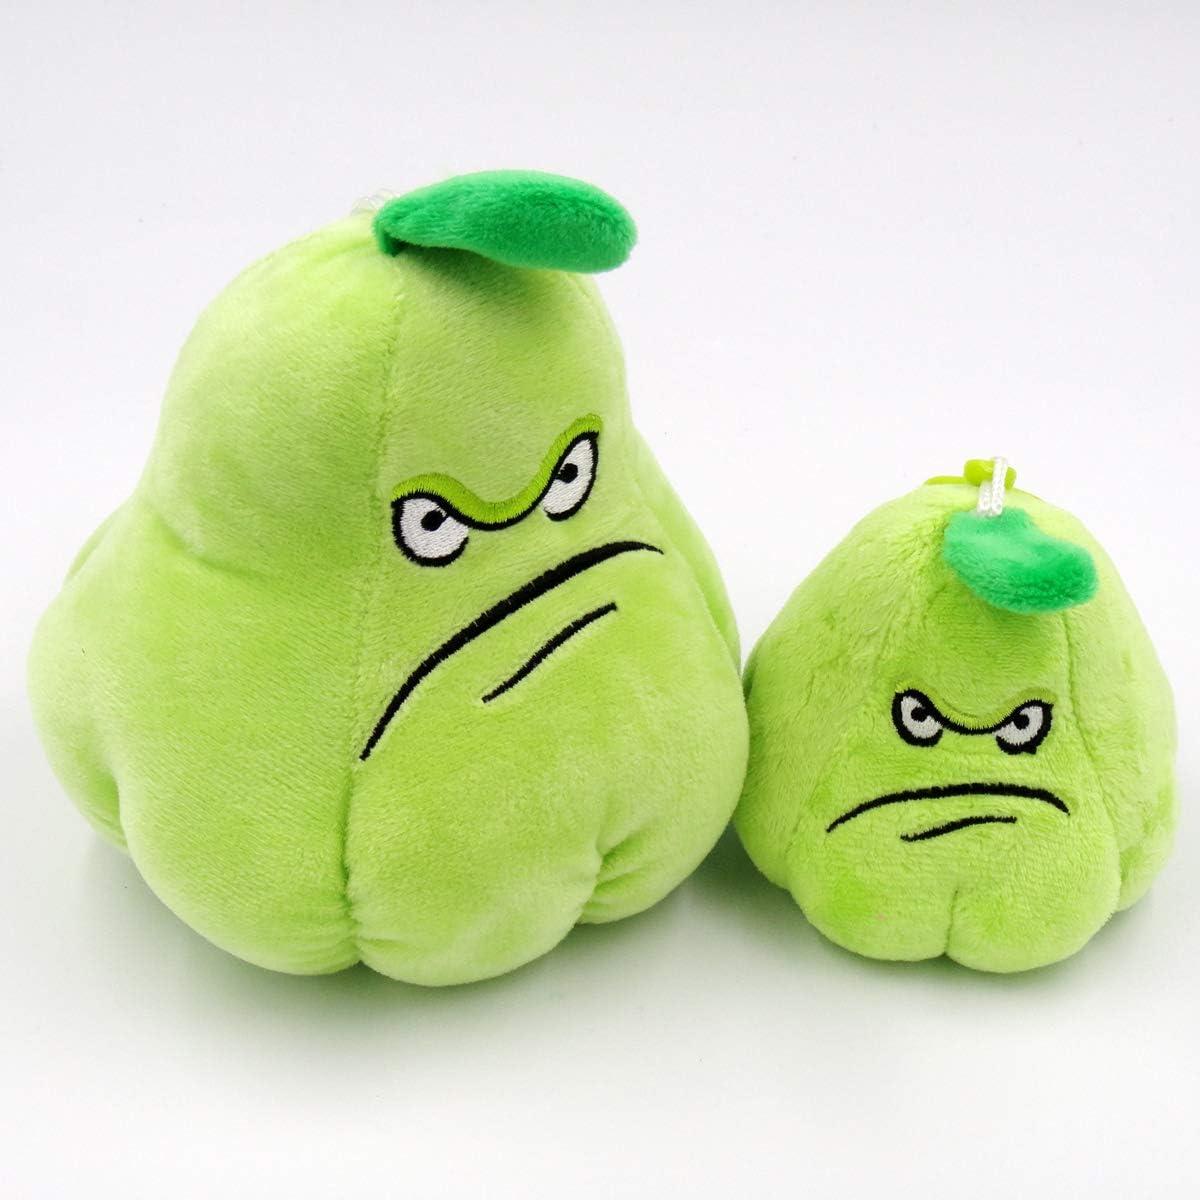 TavasHome Plants VS Zombies 2 PVZ Figures Plush Set Toys Stuffed SALENEW very popular! Superior